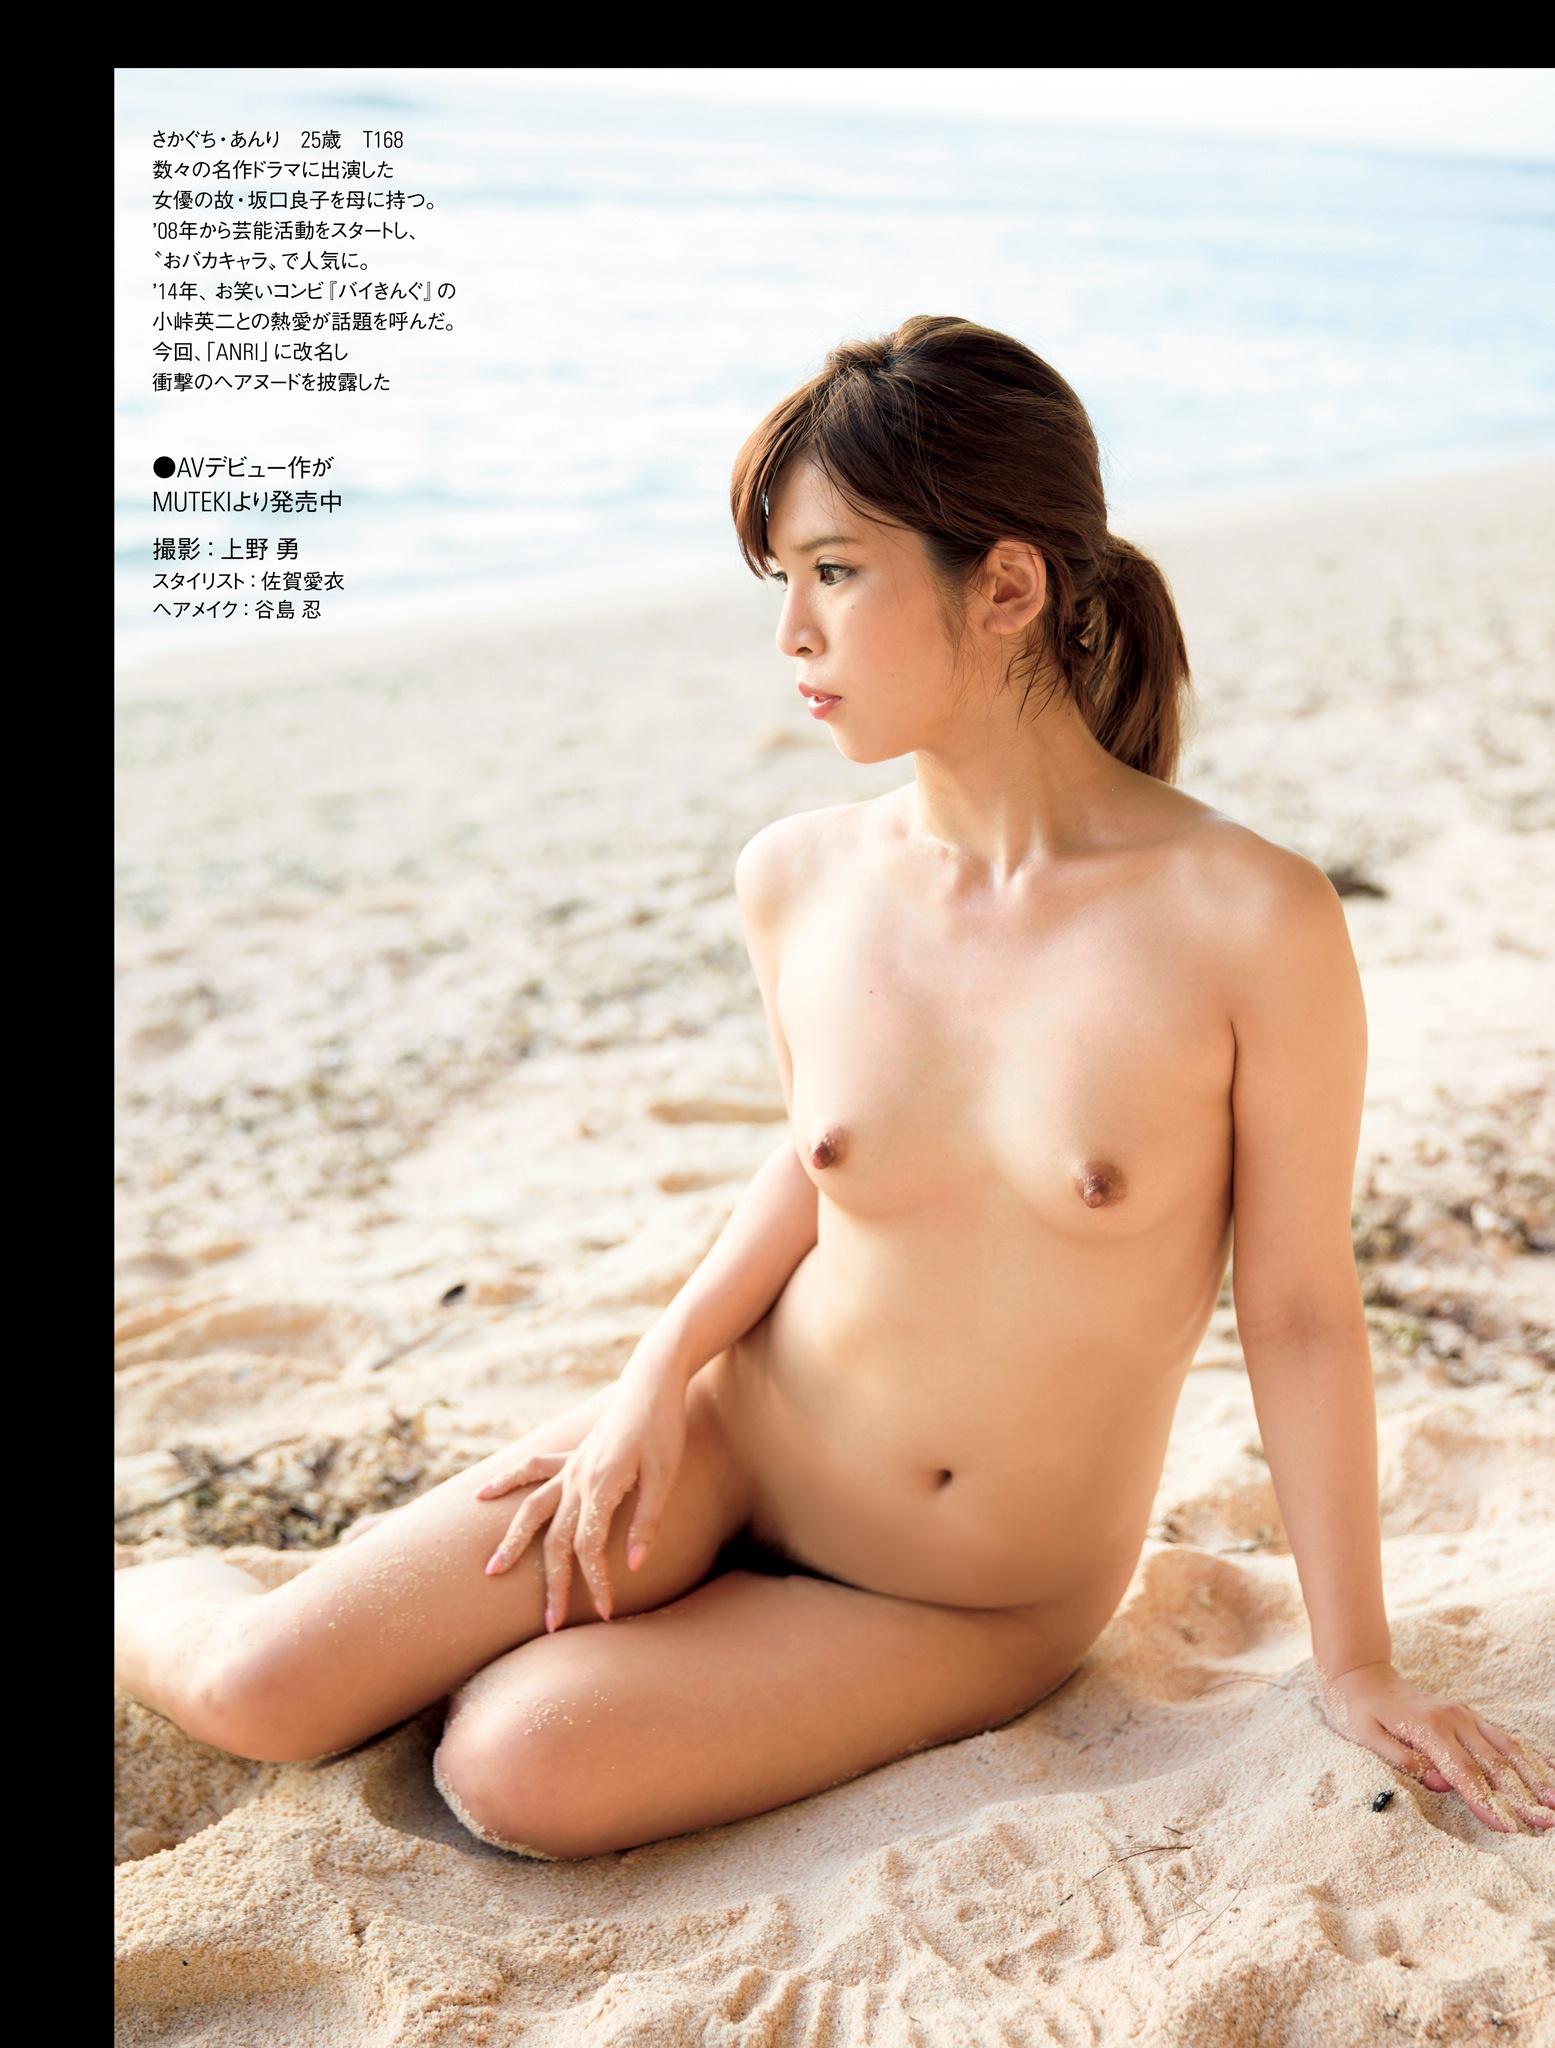 ANRIの浜辺セクシー全裸ヌード